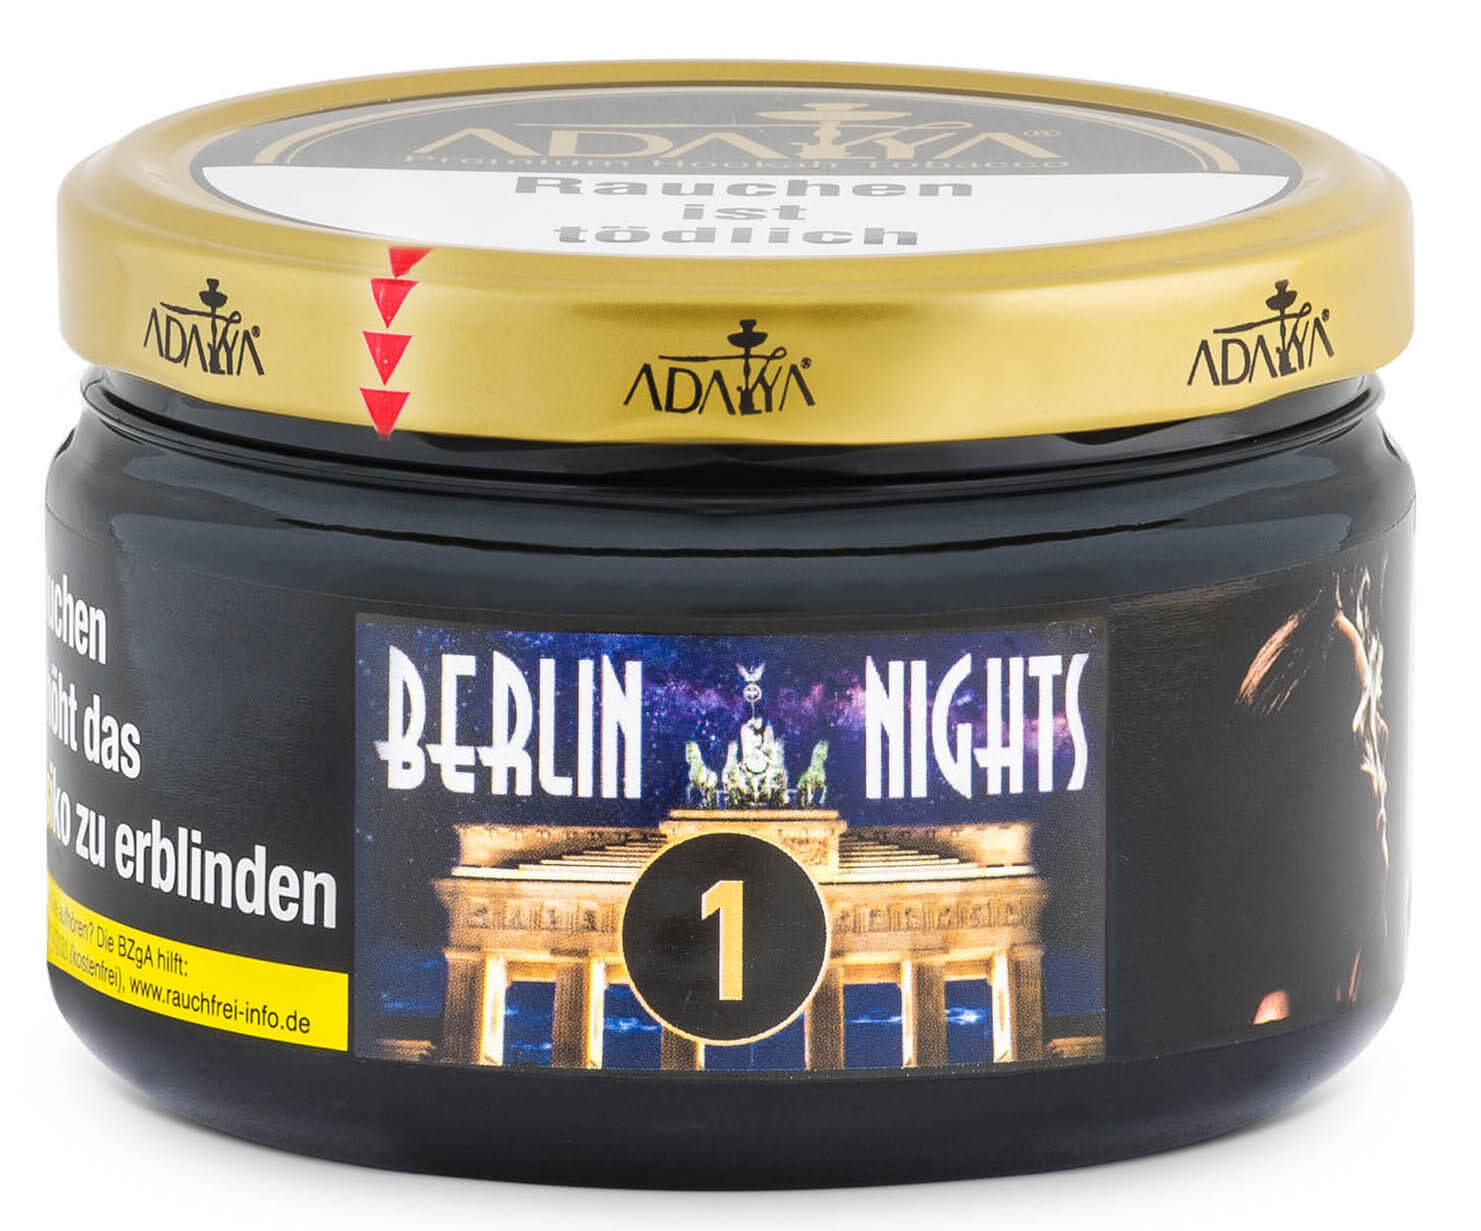 Adalya Tabak Berlin Nights #1 200g